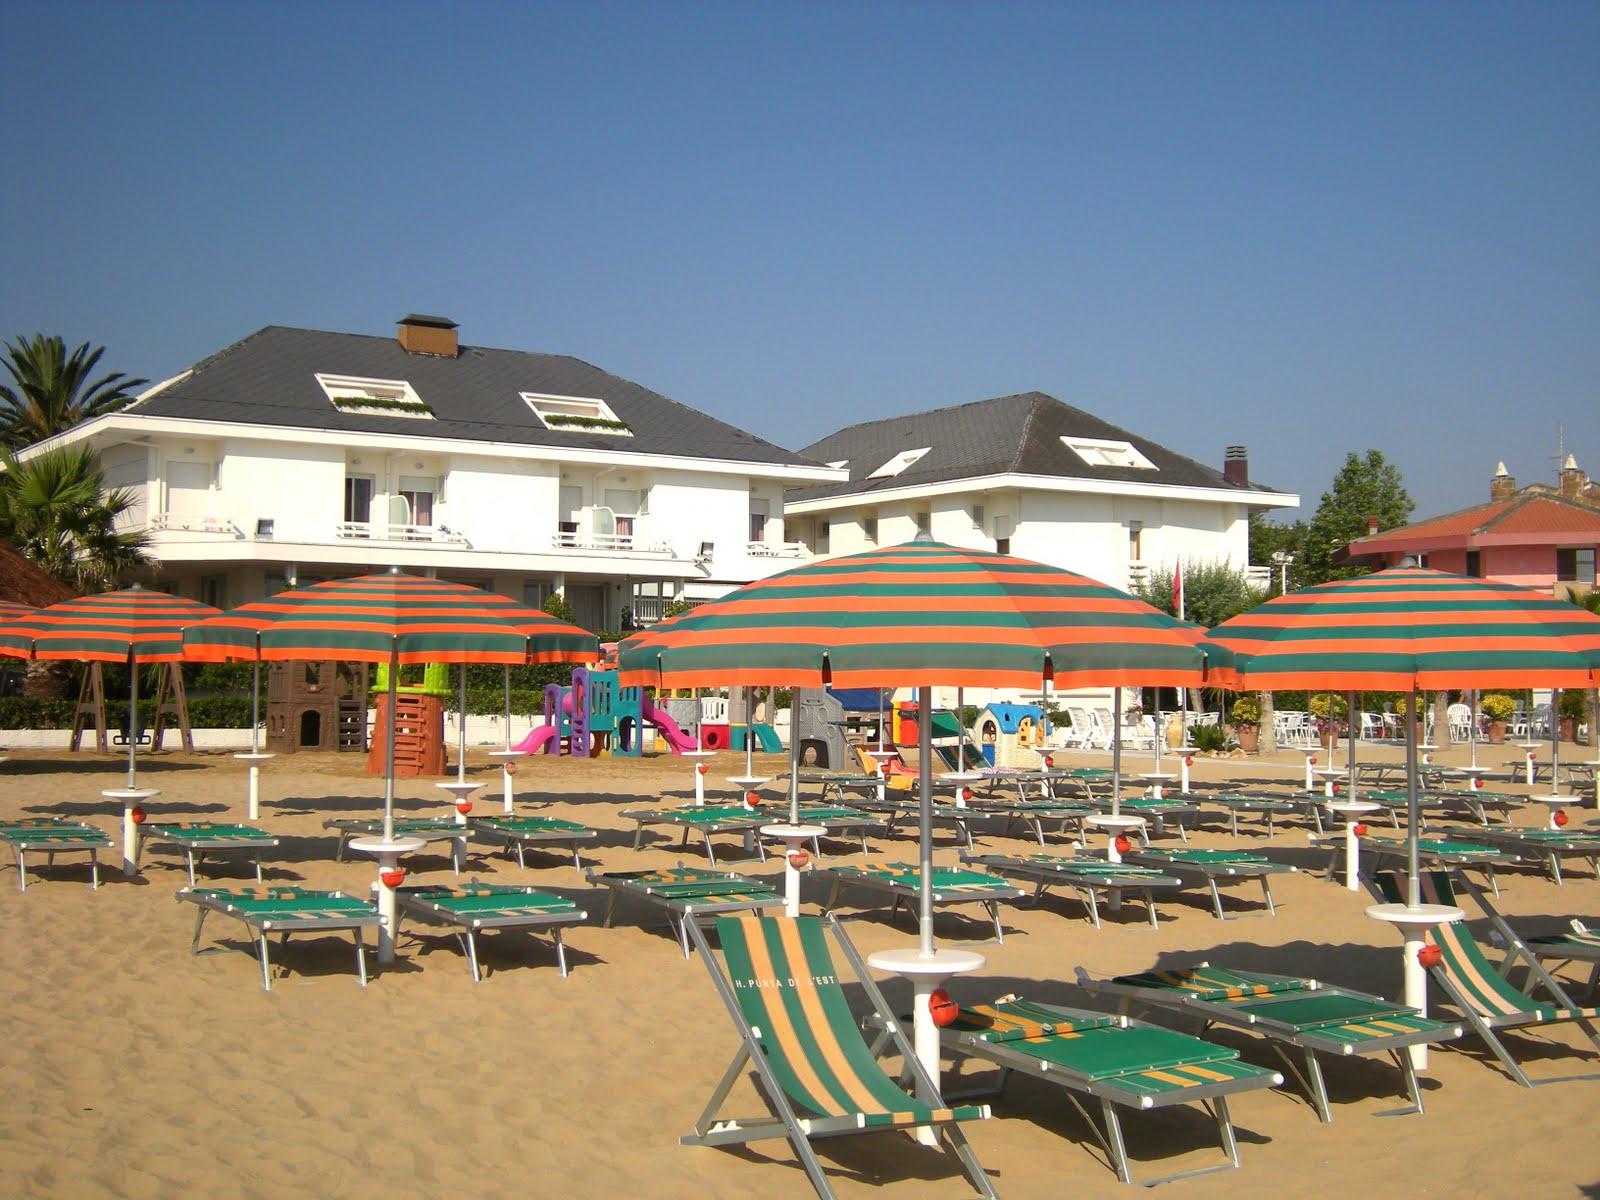 Chiaraemassi il blog hotel punta de l 39 est francavilla for Mobilia arredamenti francavilla al mare